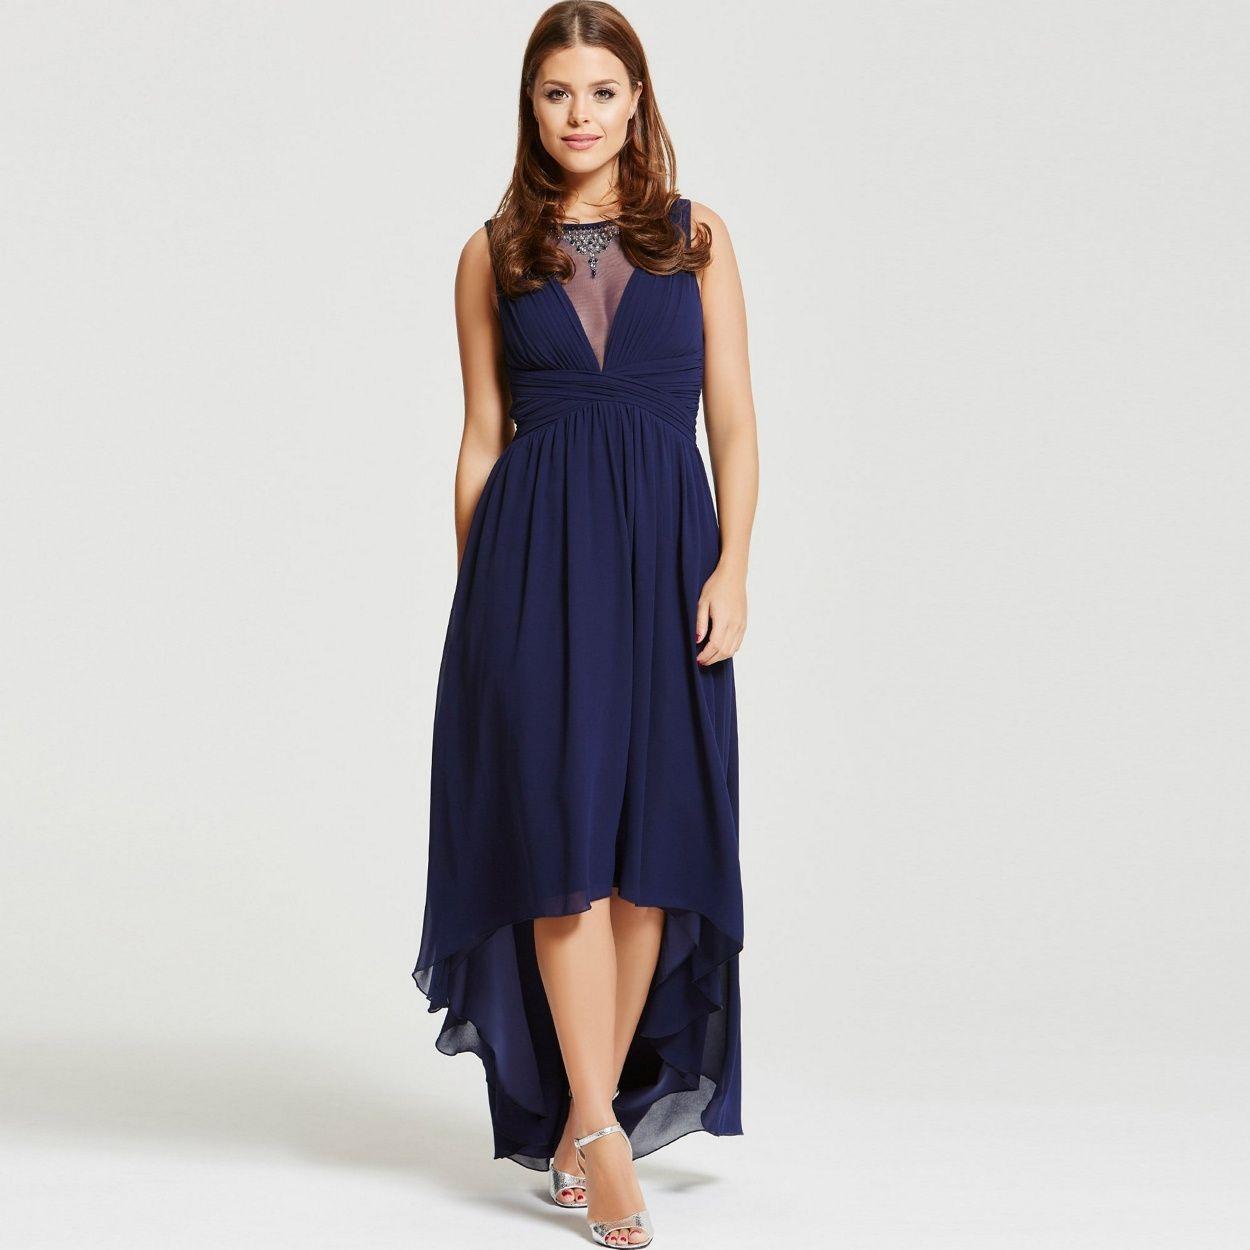 Black dress debenhams - Black Lace Bodice Dip Hem Maxi Dress